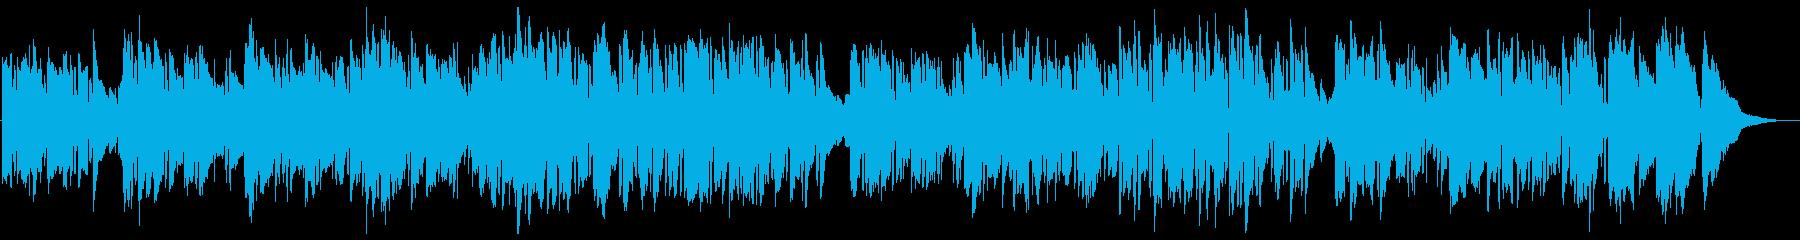 Hawaii Aloha(ハワイアン)の再生済みの波形